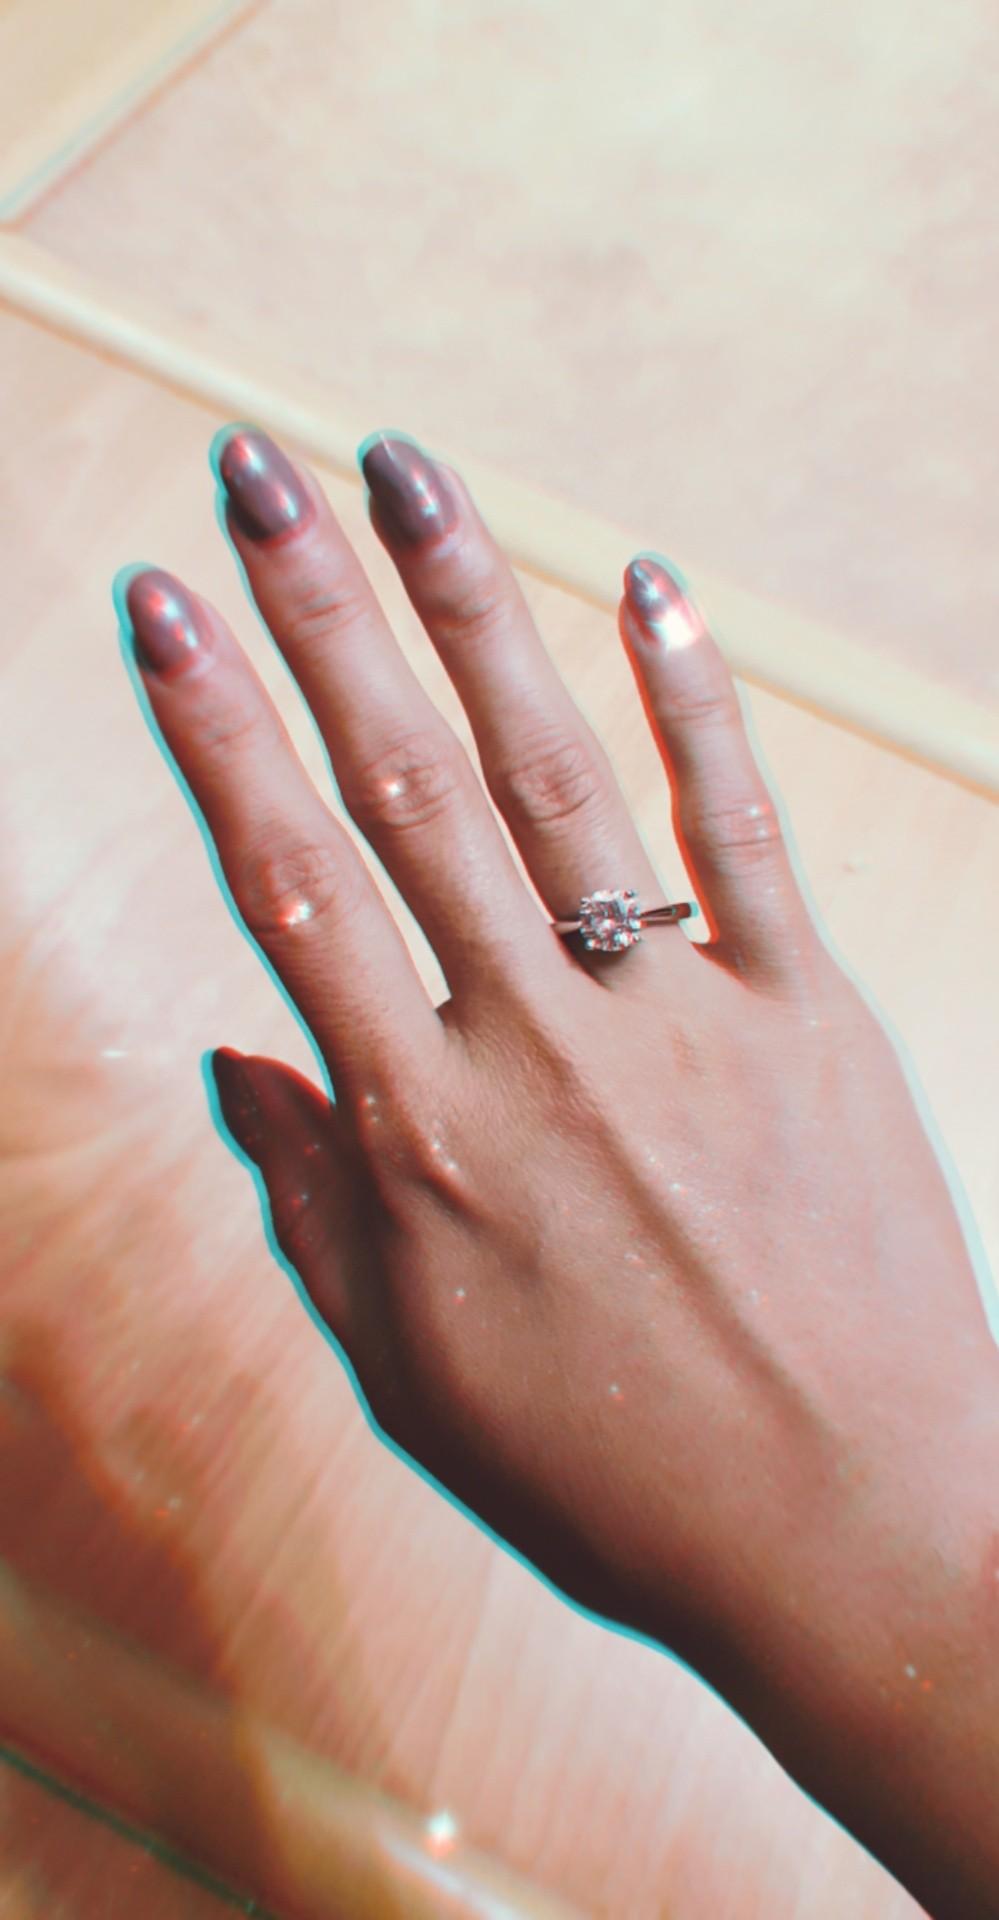 Кольцо на миниатюрную руку